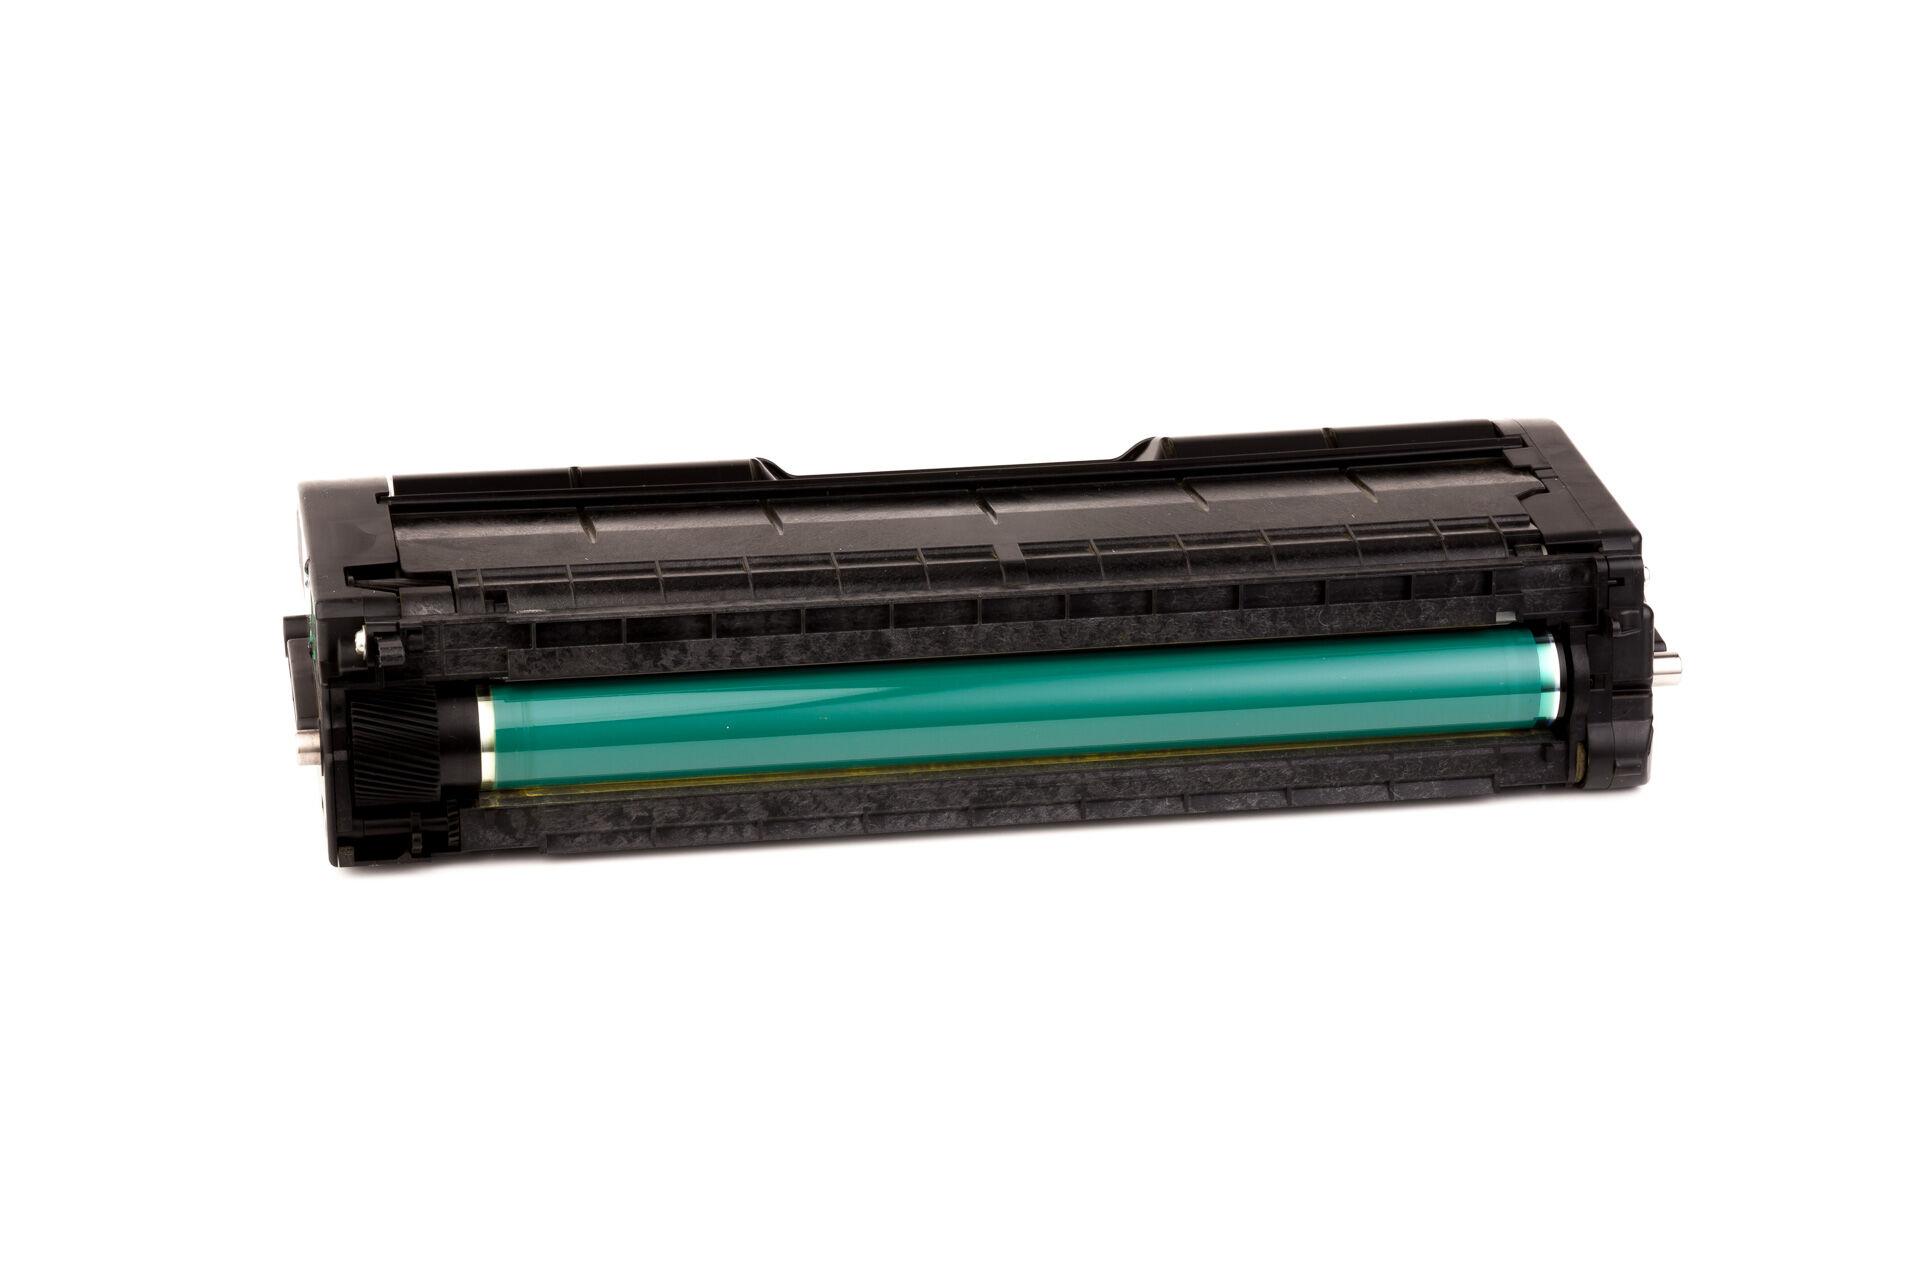 Ricoh Cartouche de Toner pour Ricoh 406099 / TYPE SPC 220 E magenta compatible (de marque ASC)